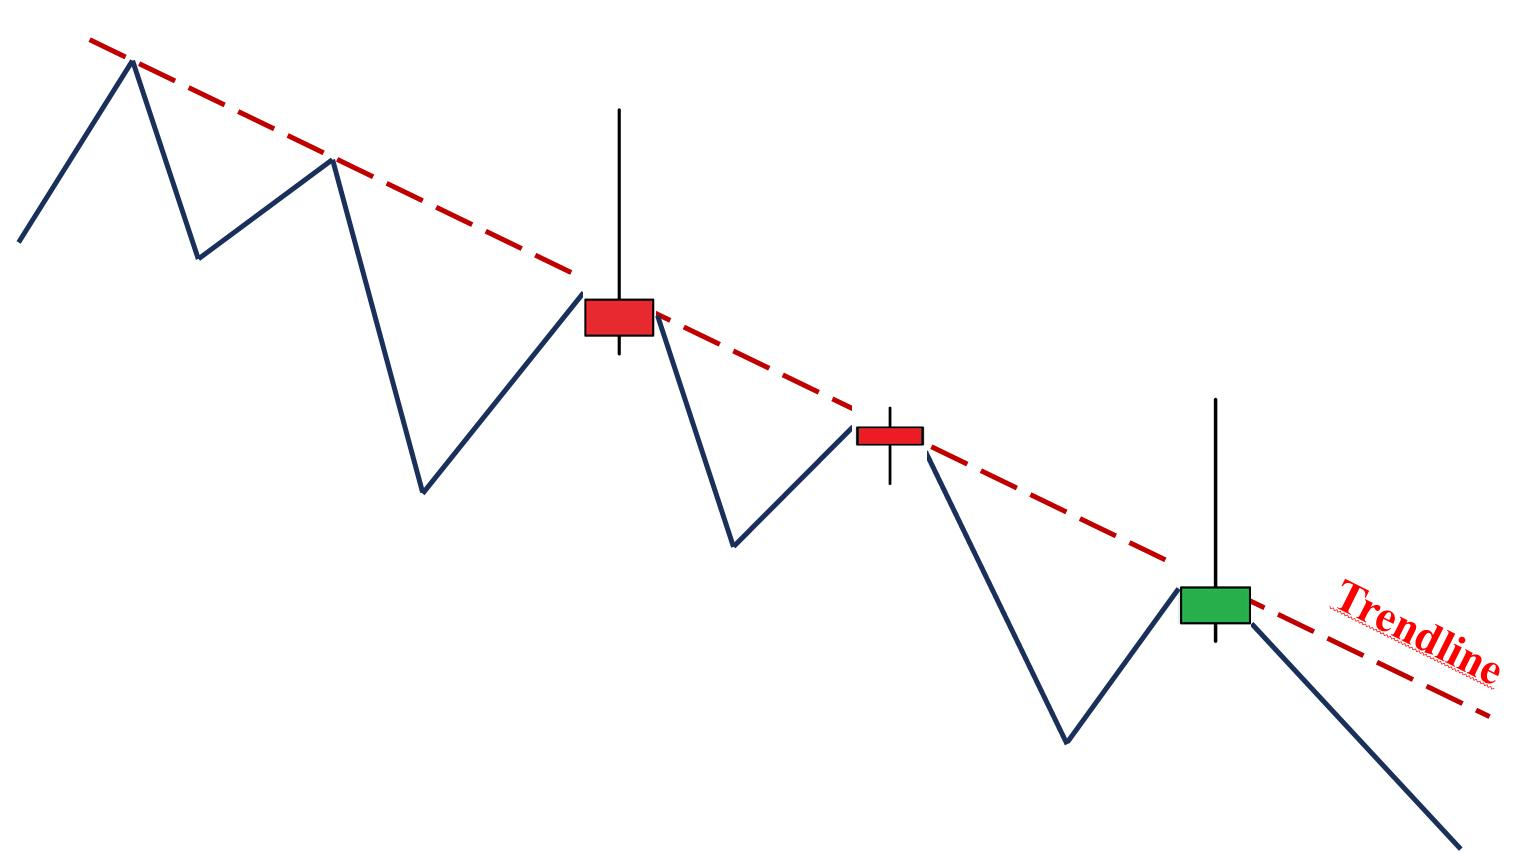 Trendline همراه با Candlesticks Doji و Bearish Pin Bar